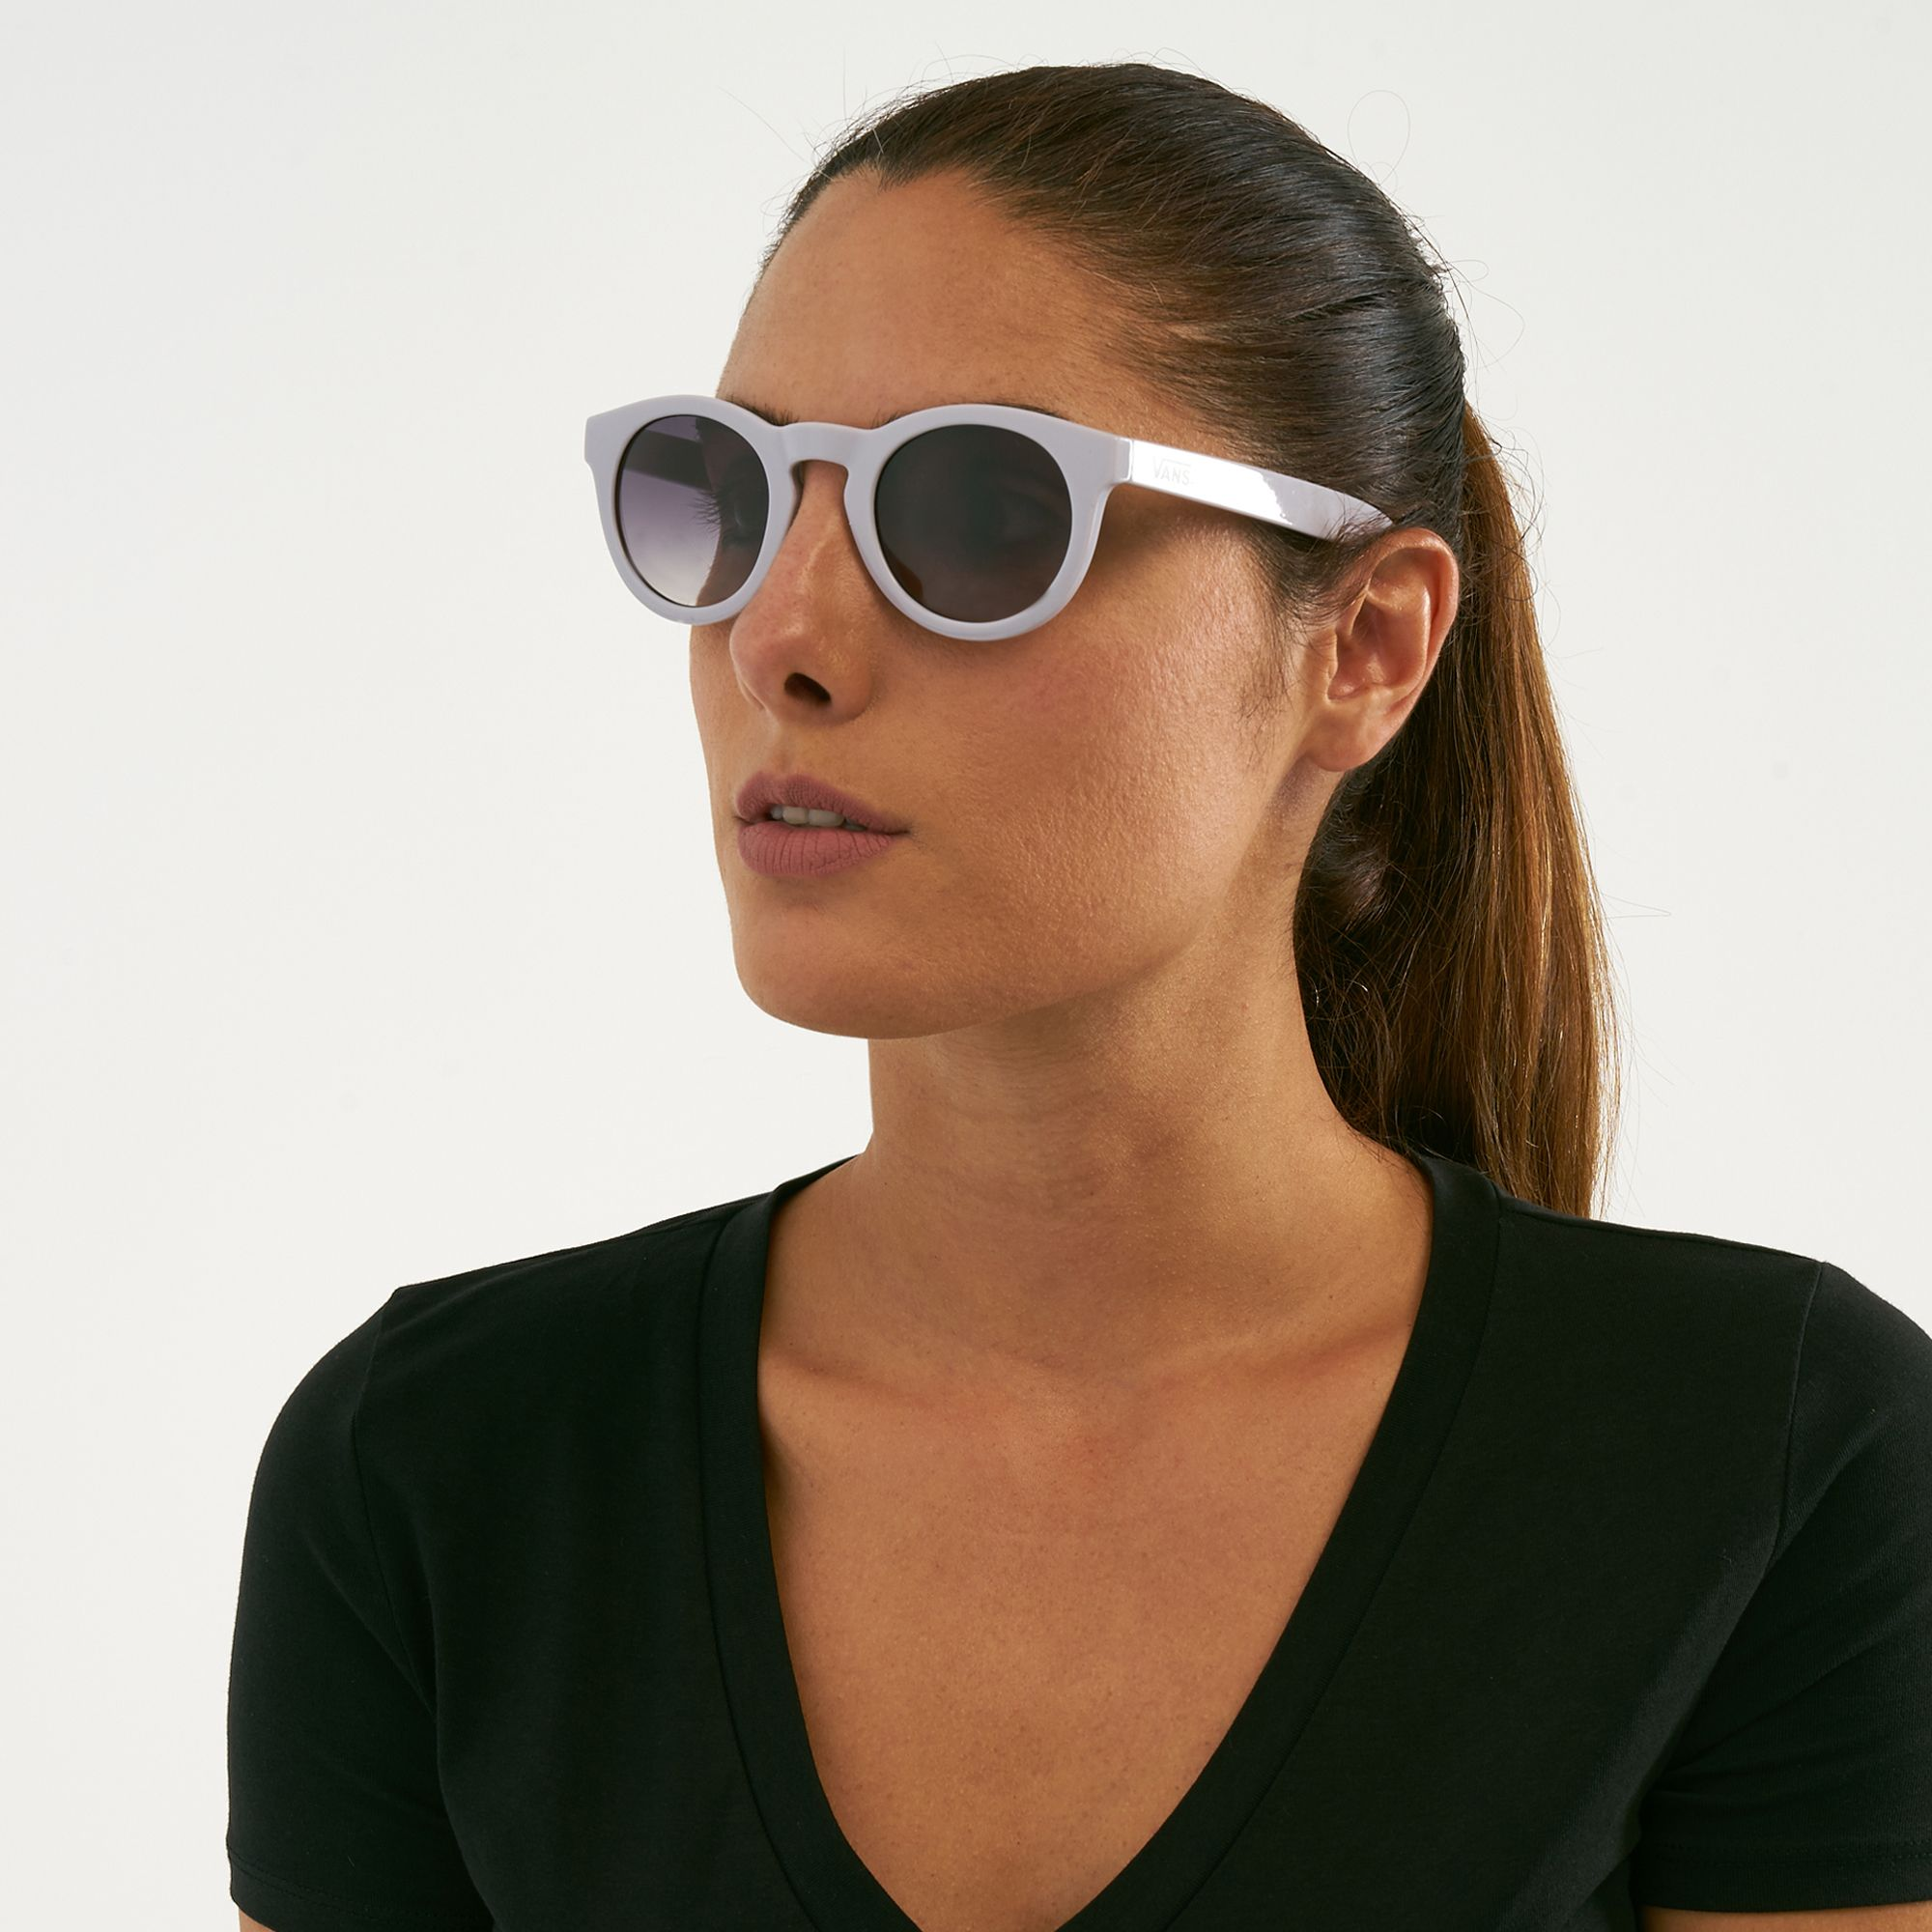 Vans Lolligagger Sunglasses Sunglasses Accessories Womens Sss